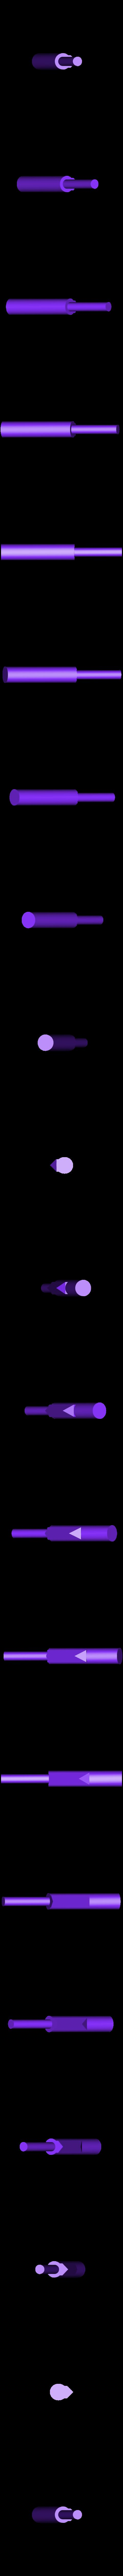 Shoulder_Deco_2X.STL Download STL file Low Poly Optimus Prime • Model to 3D print, biglildesign